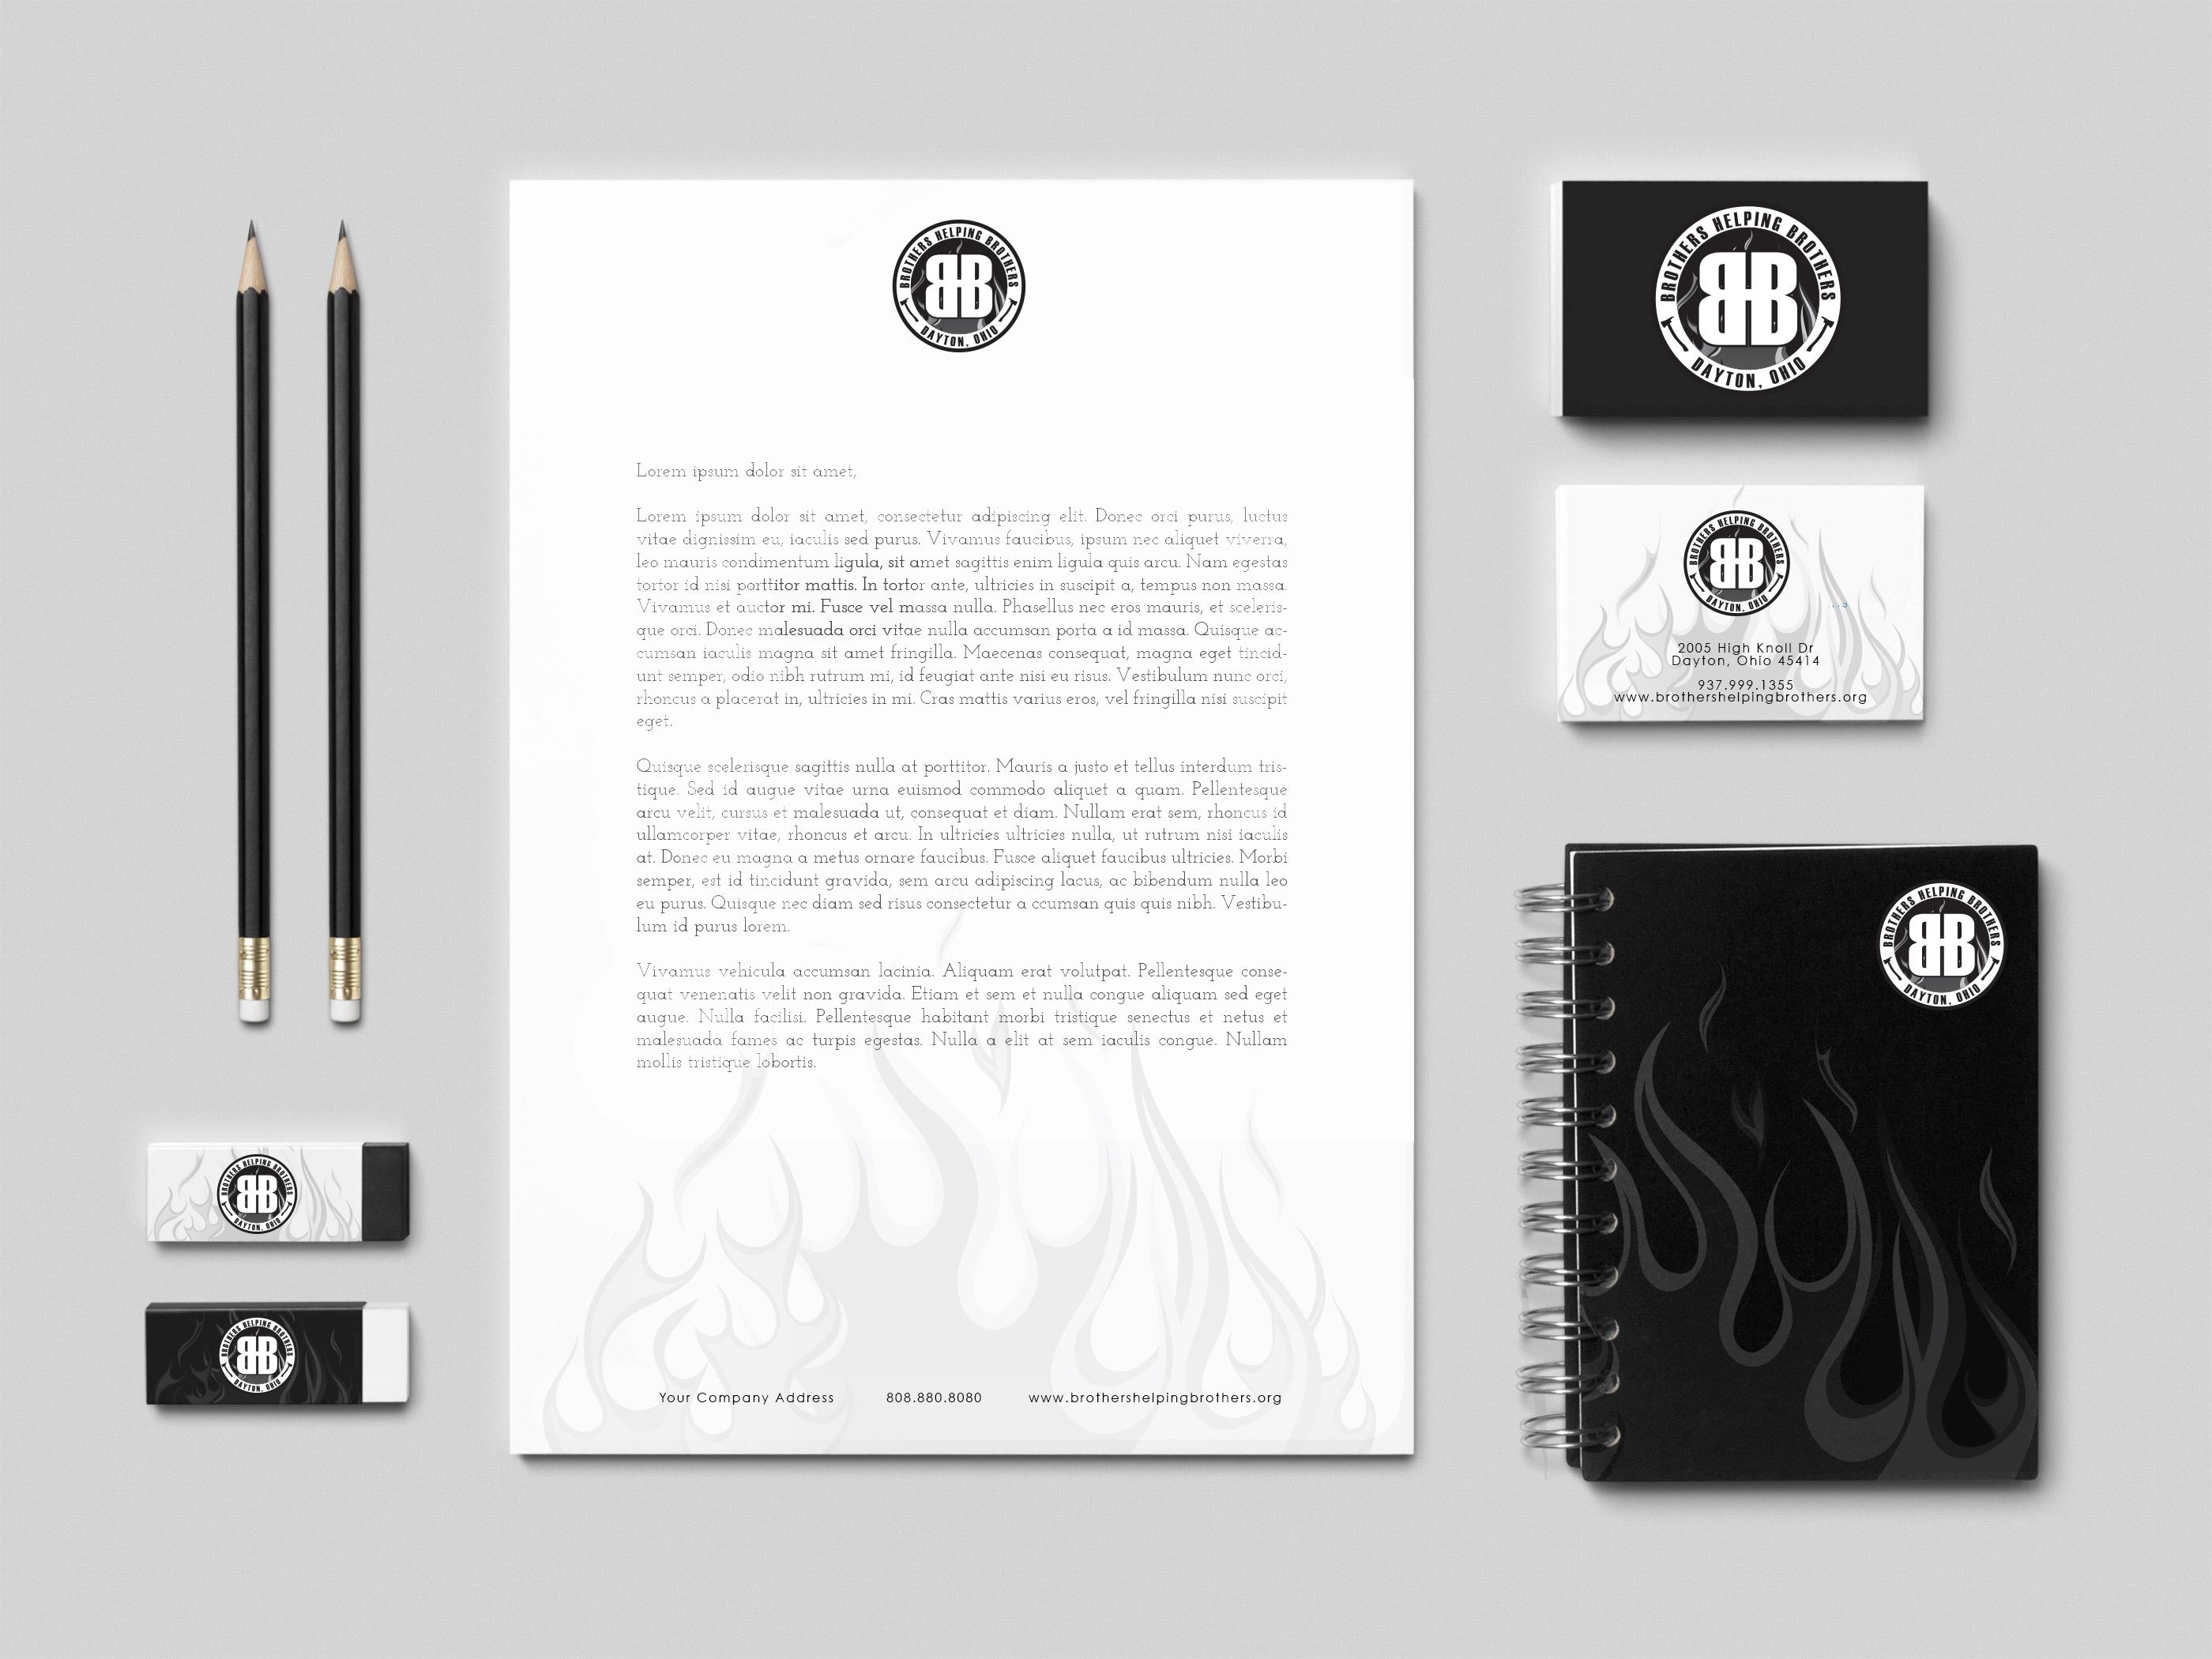 BHB_Logo-Design-1-SAMPLE.jpg